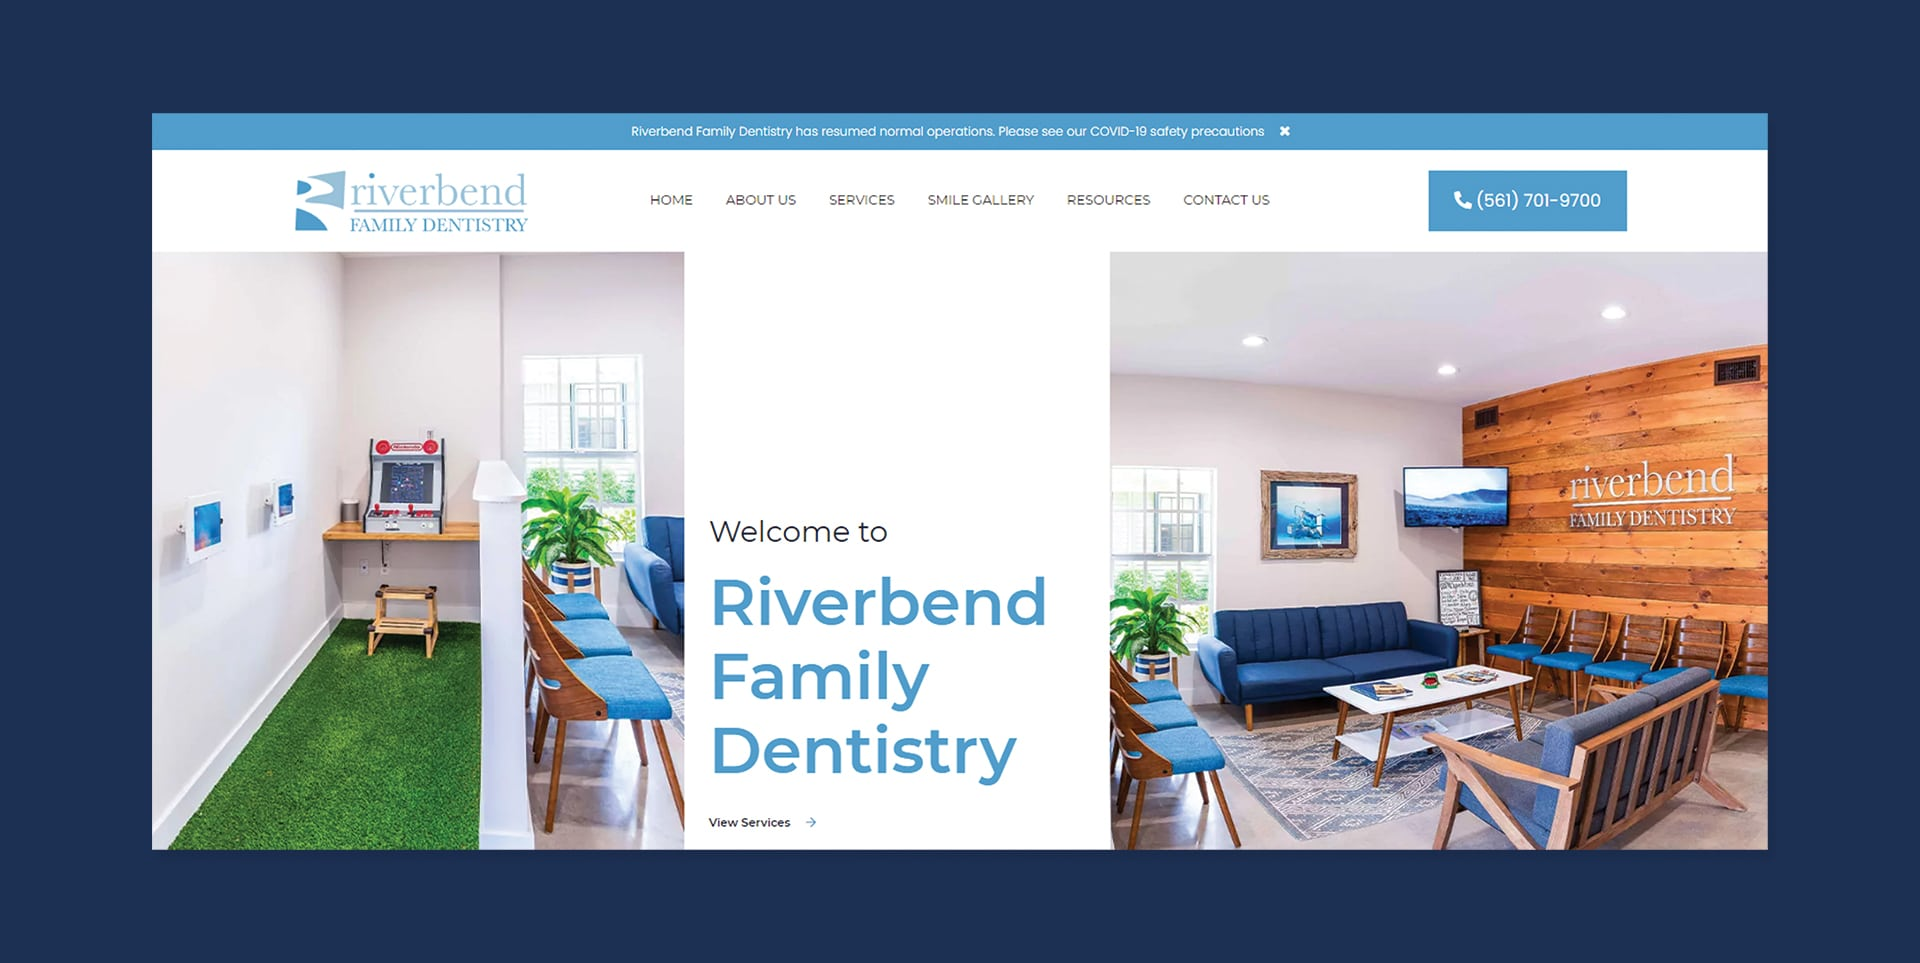 Riverbend Family Dentistry